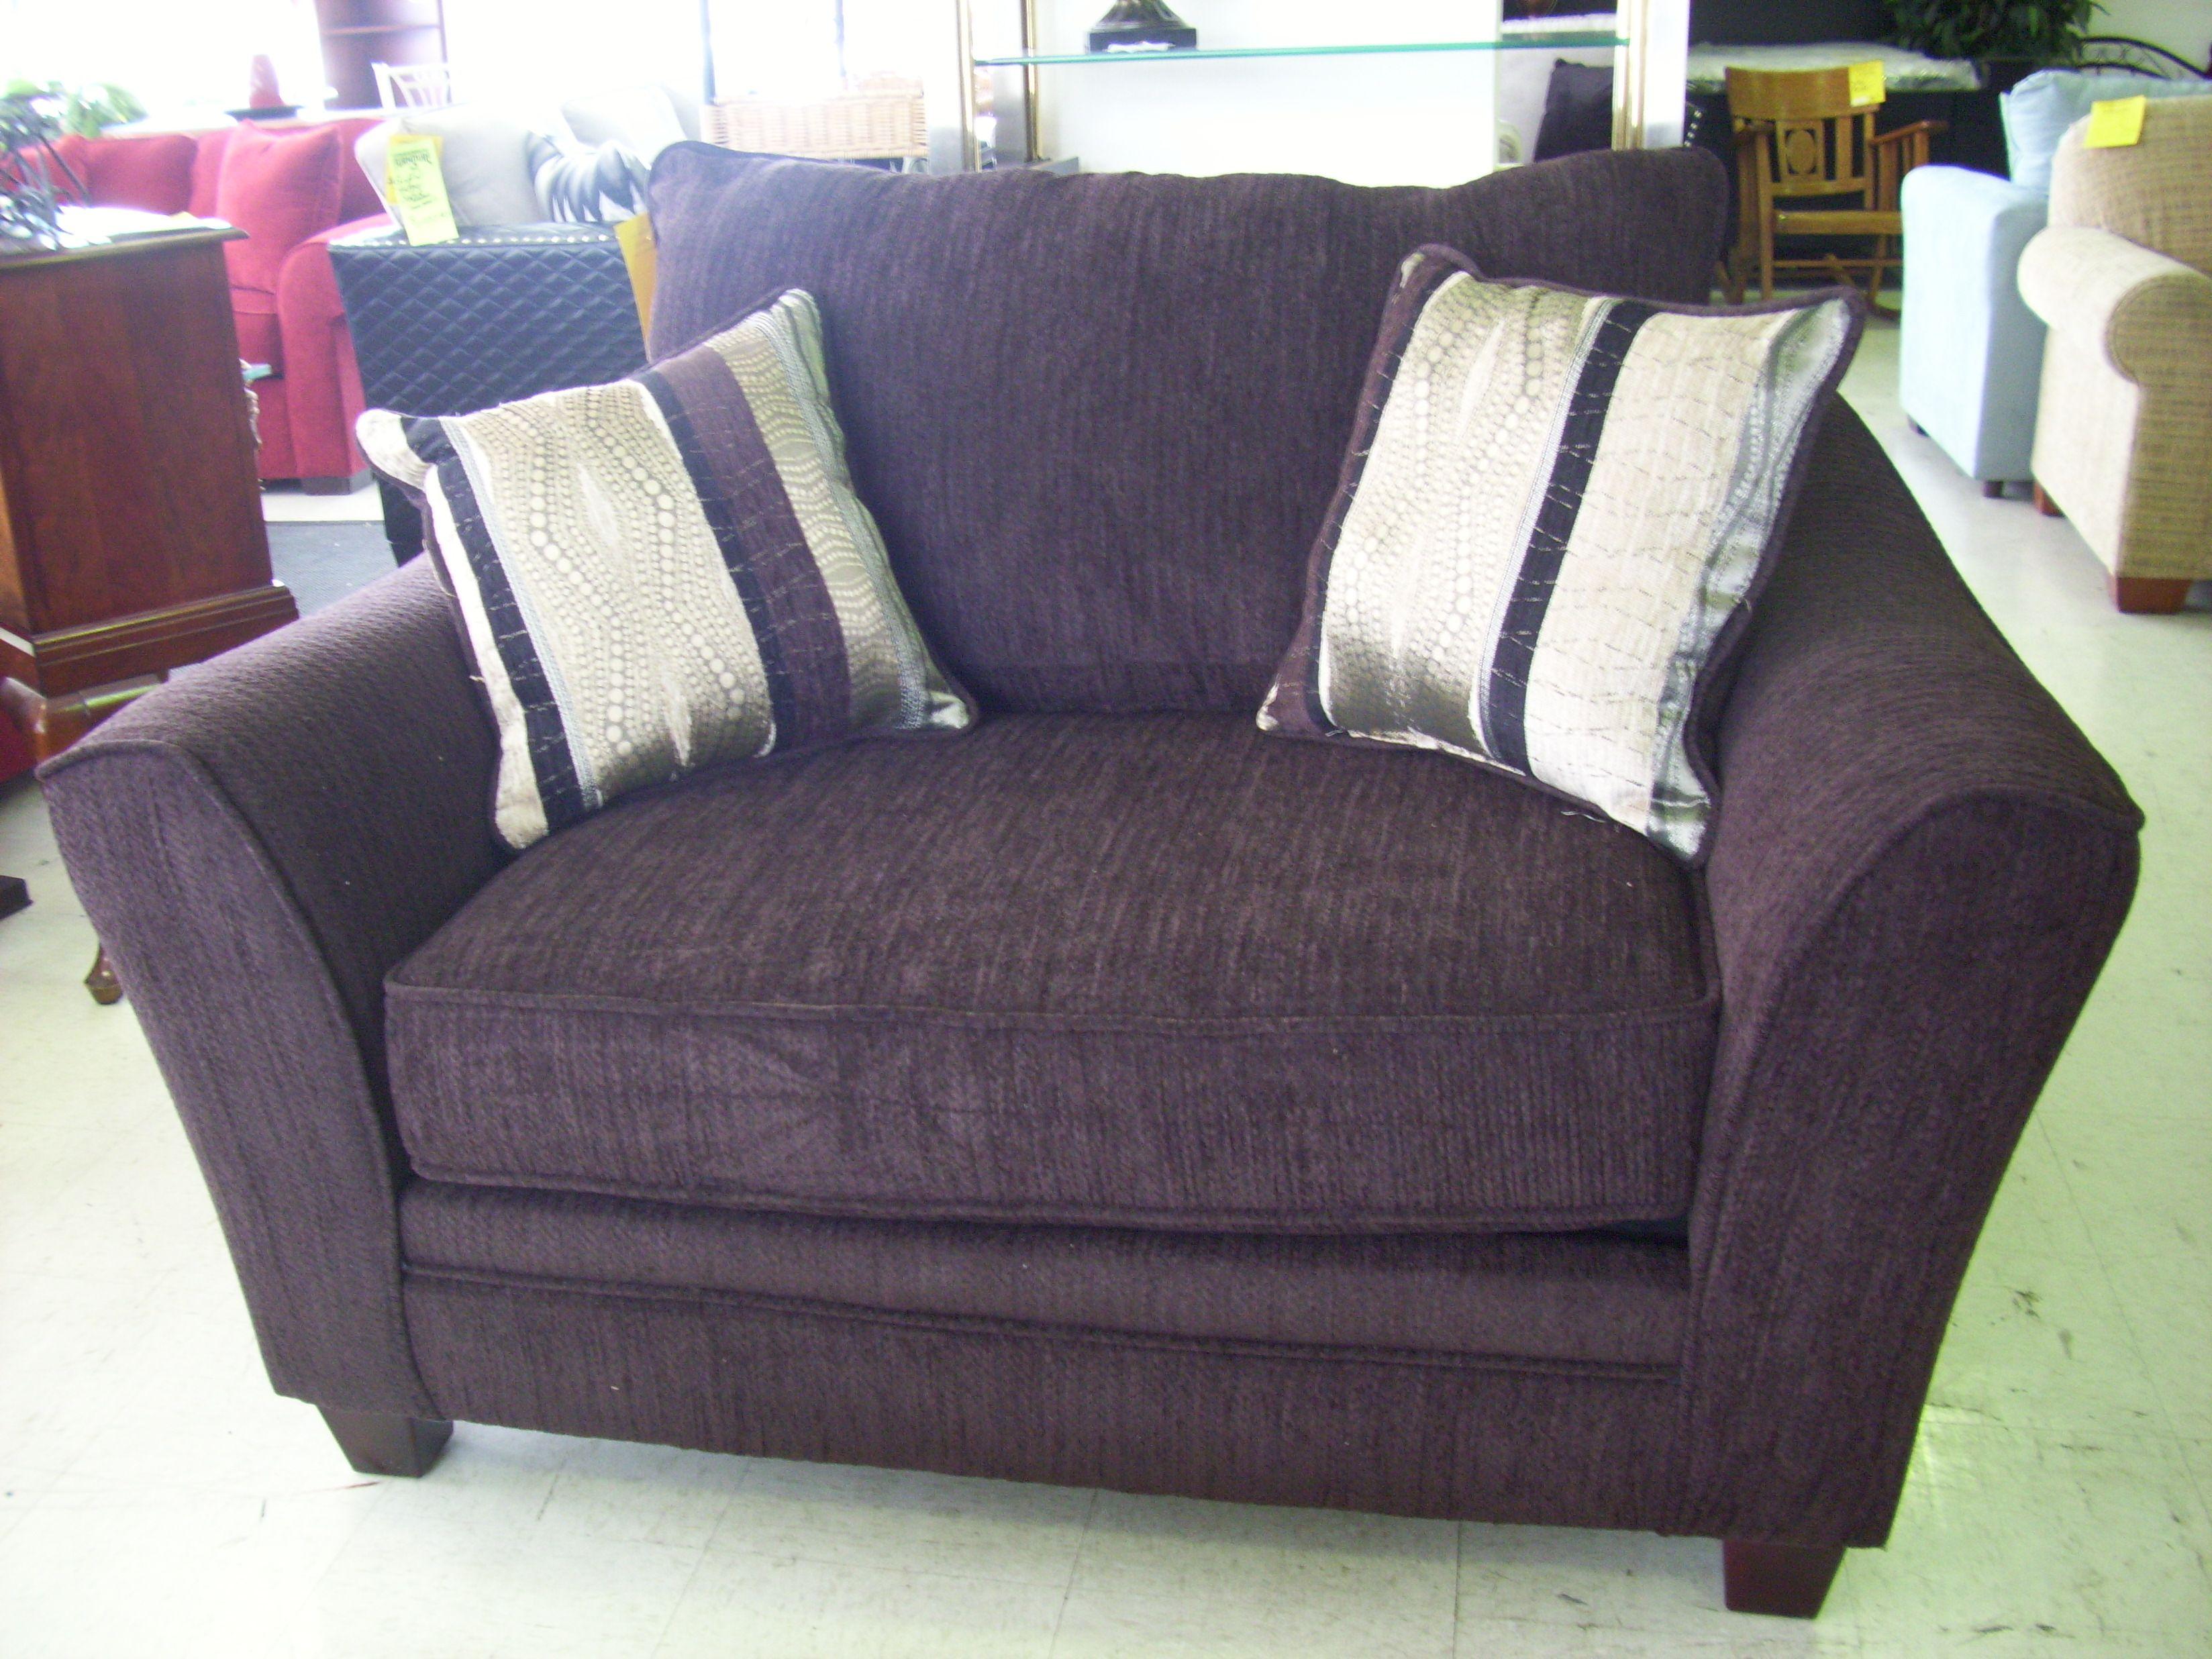 21492 waverly godiva oversized 3296 2472 for Oversized chair